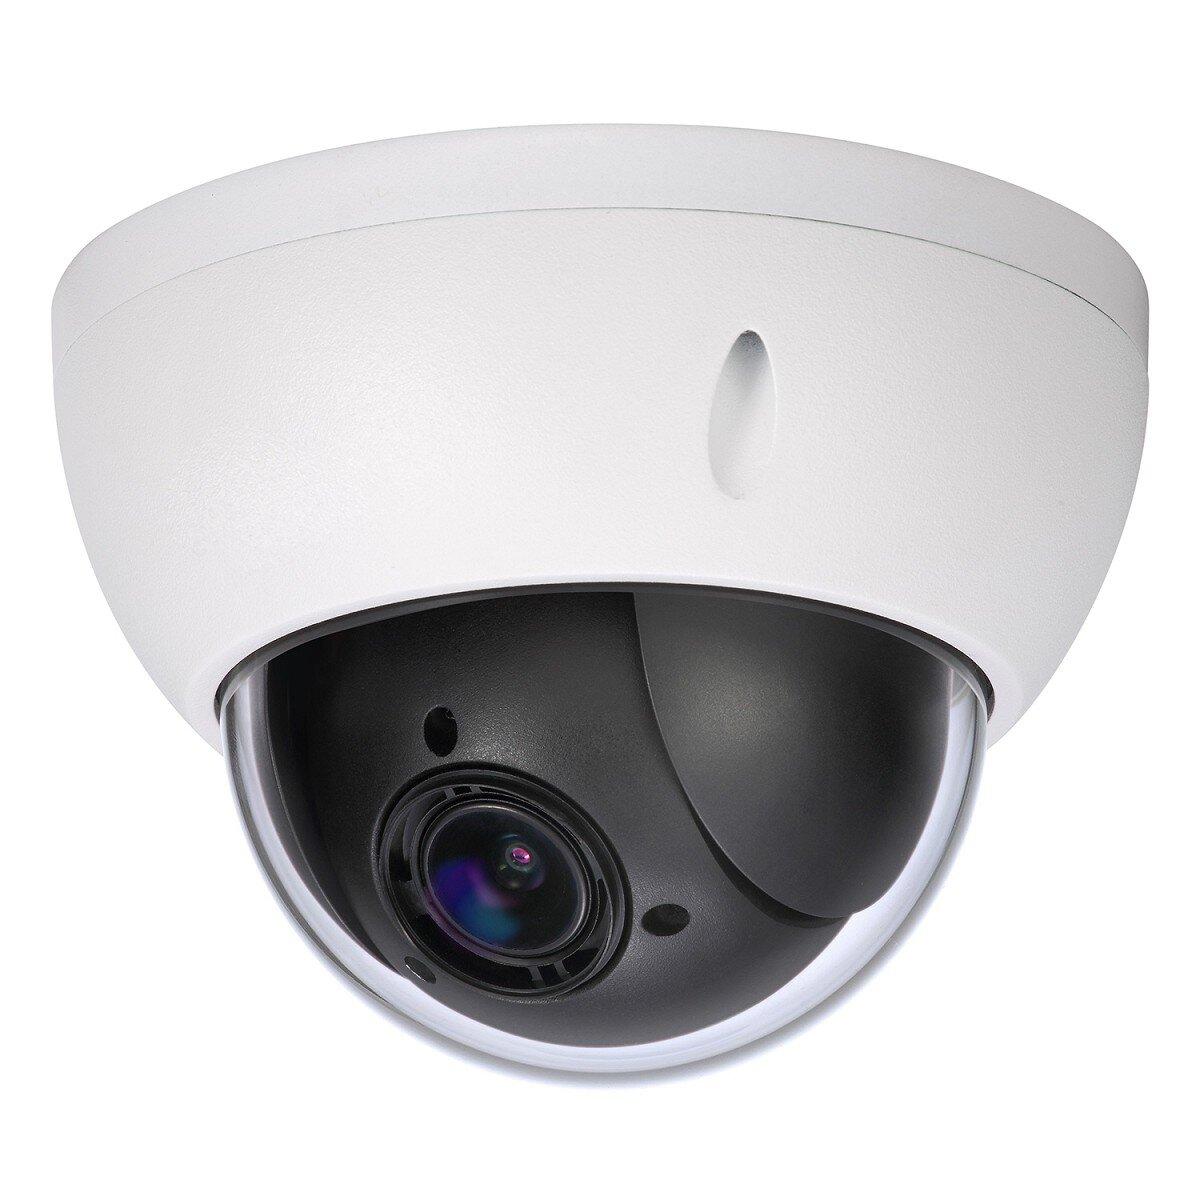 Camera IP Speed Dome 2.0 Megapixel KBVISION KX-2007sPN